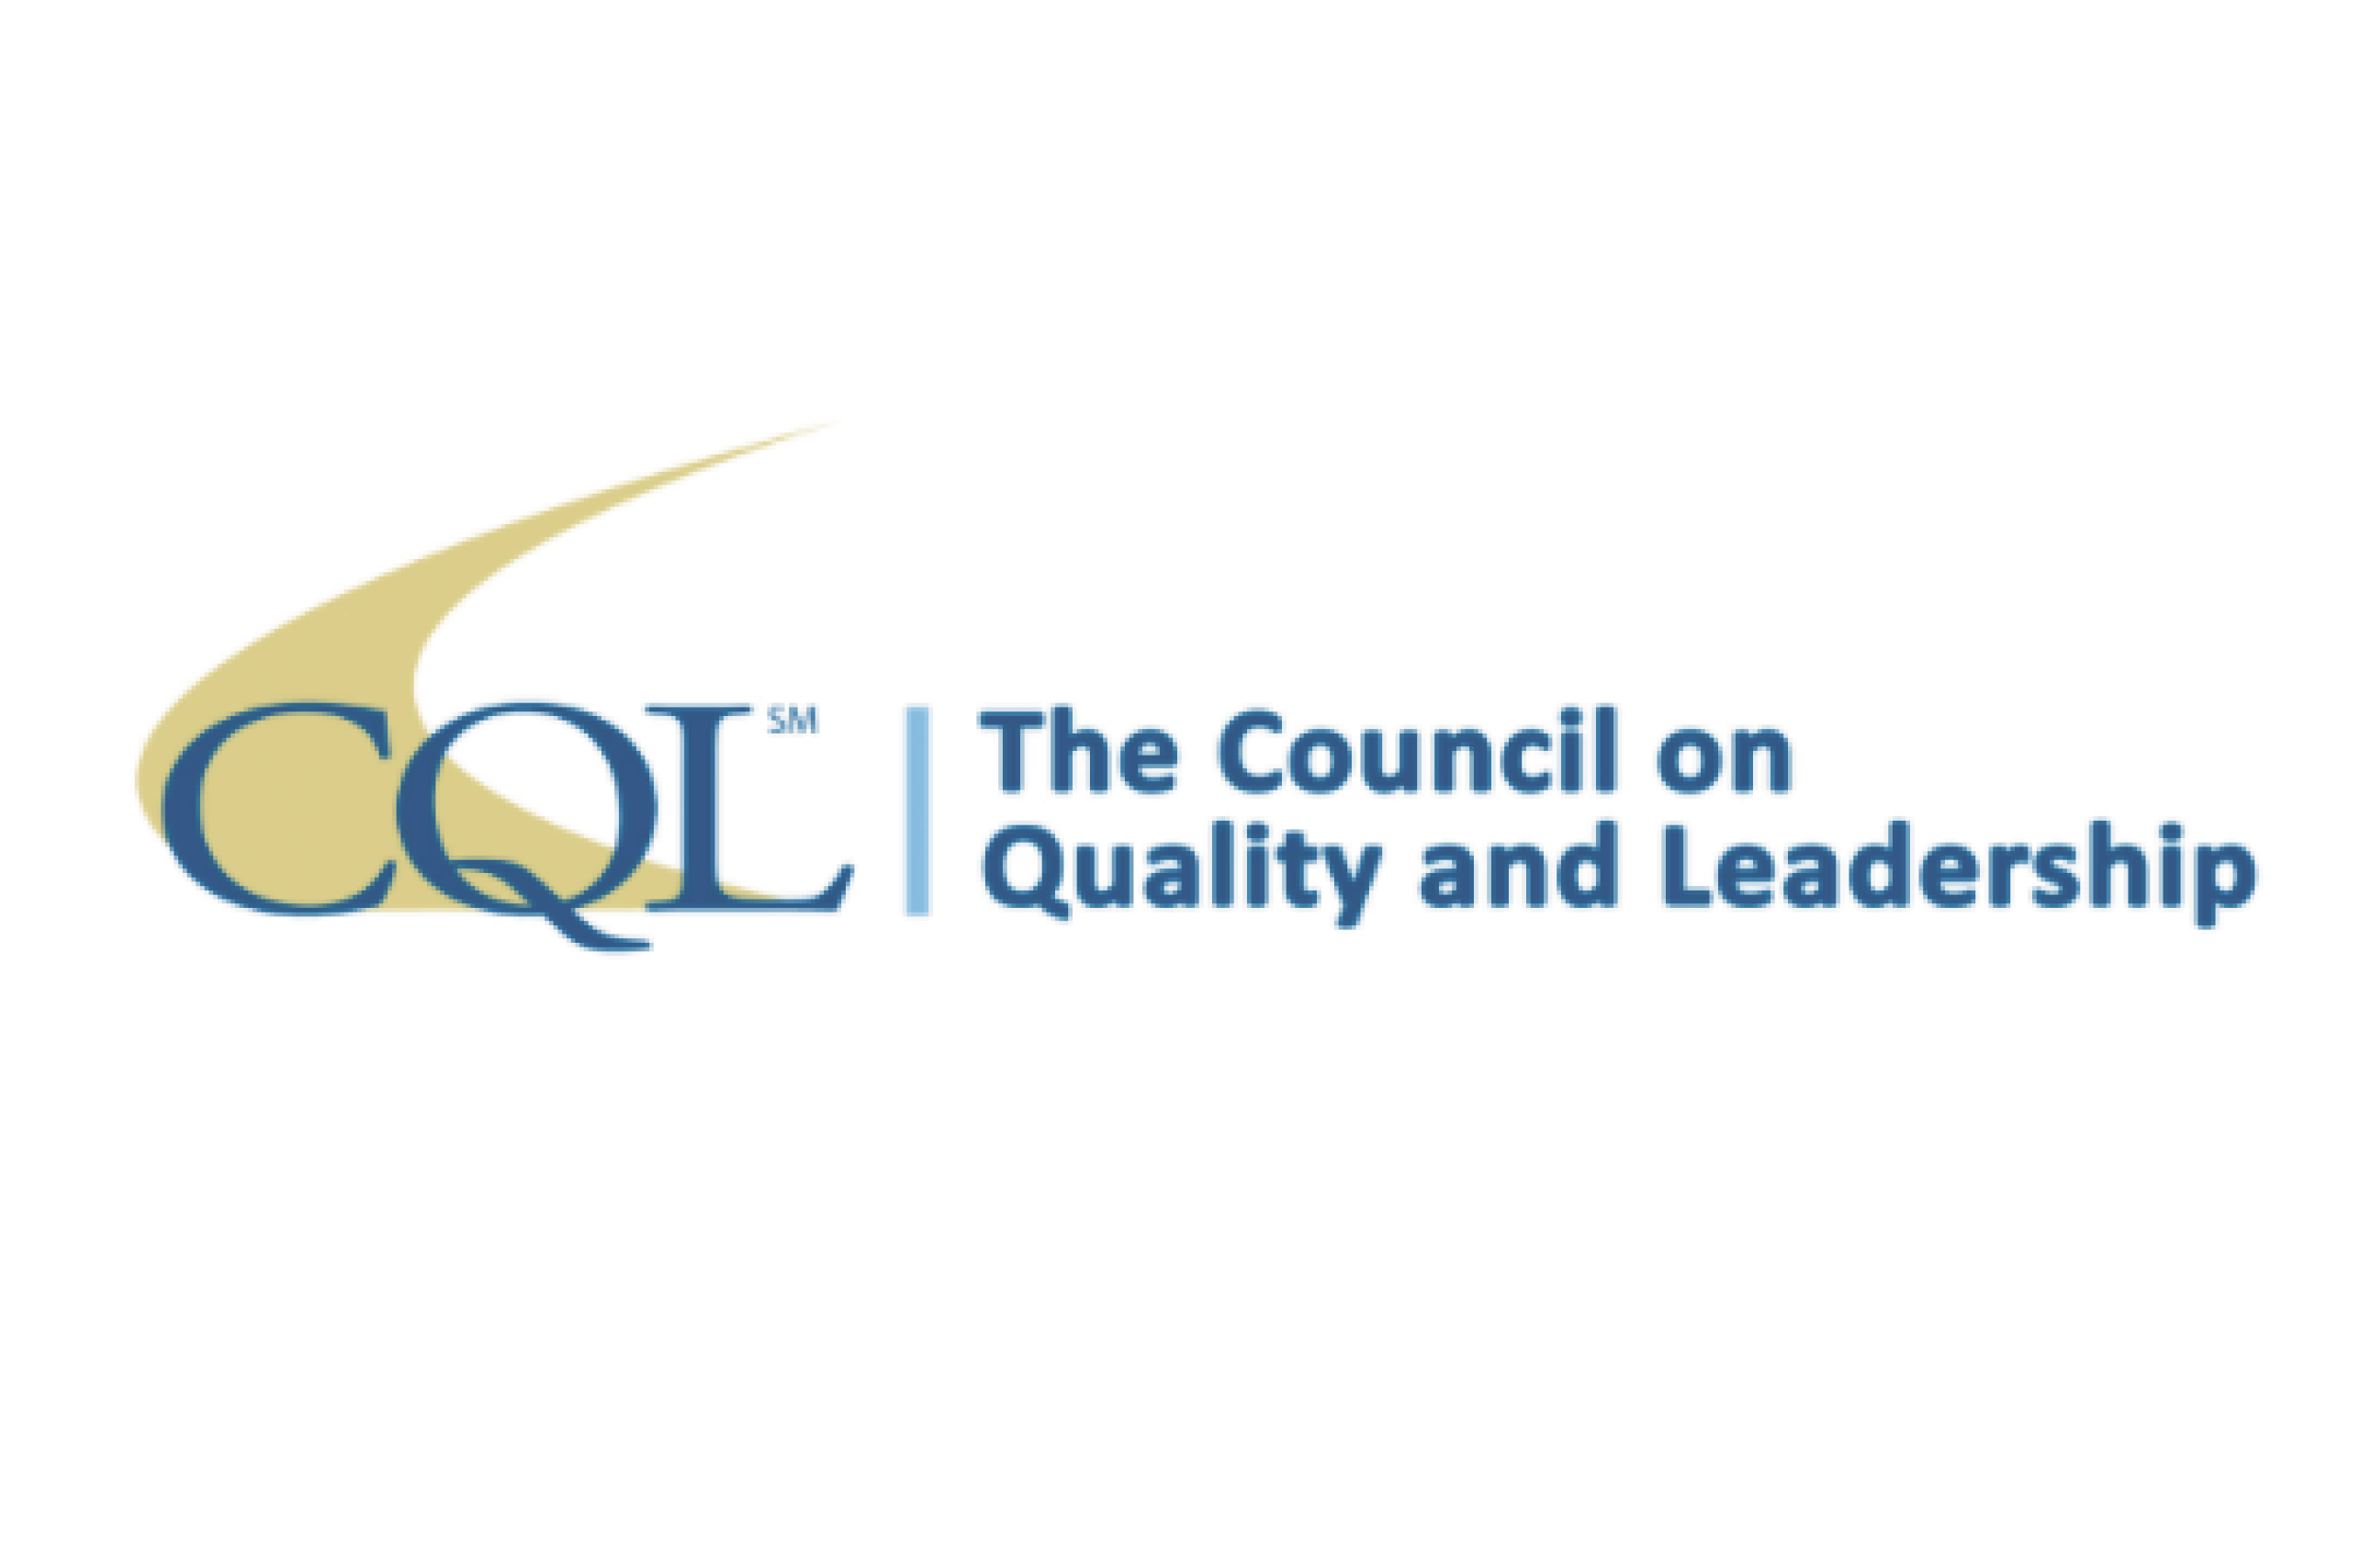 One Vision announces CQL accreditation